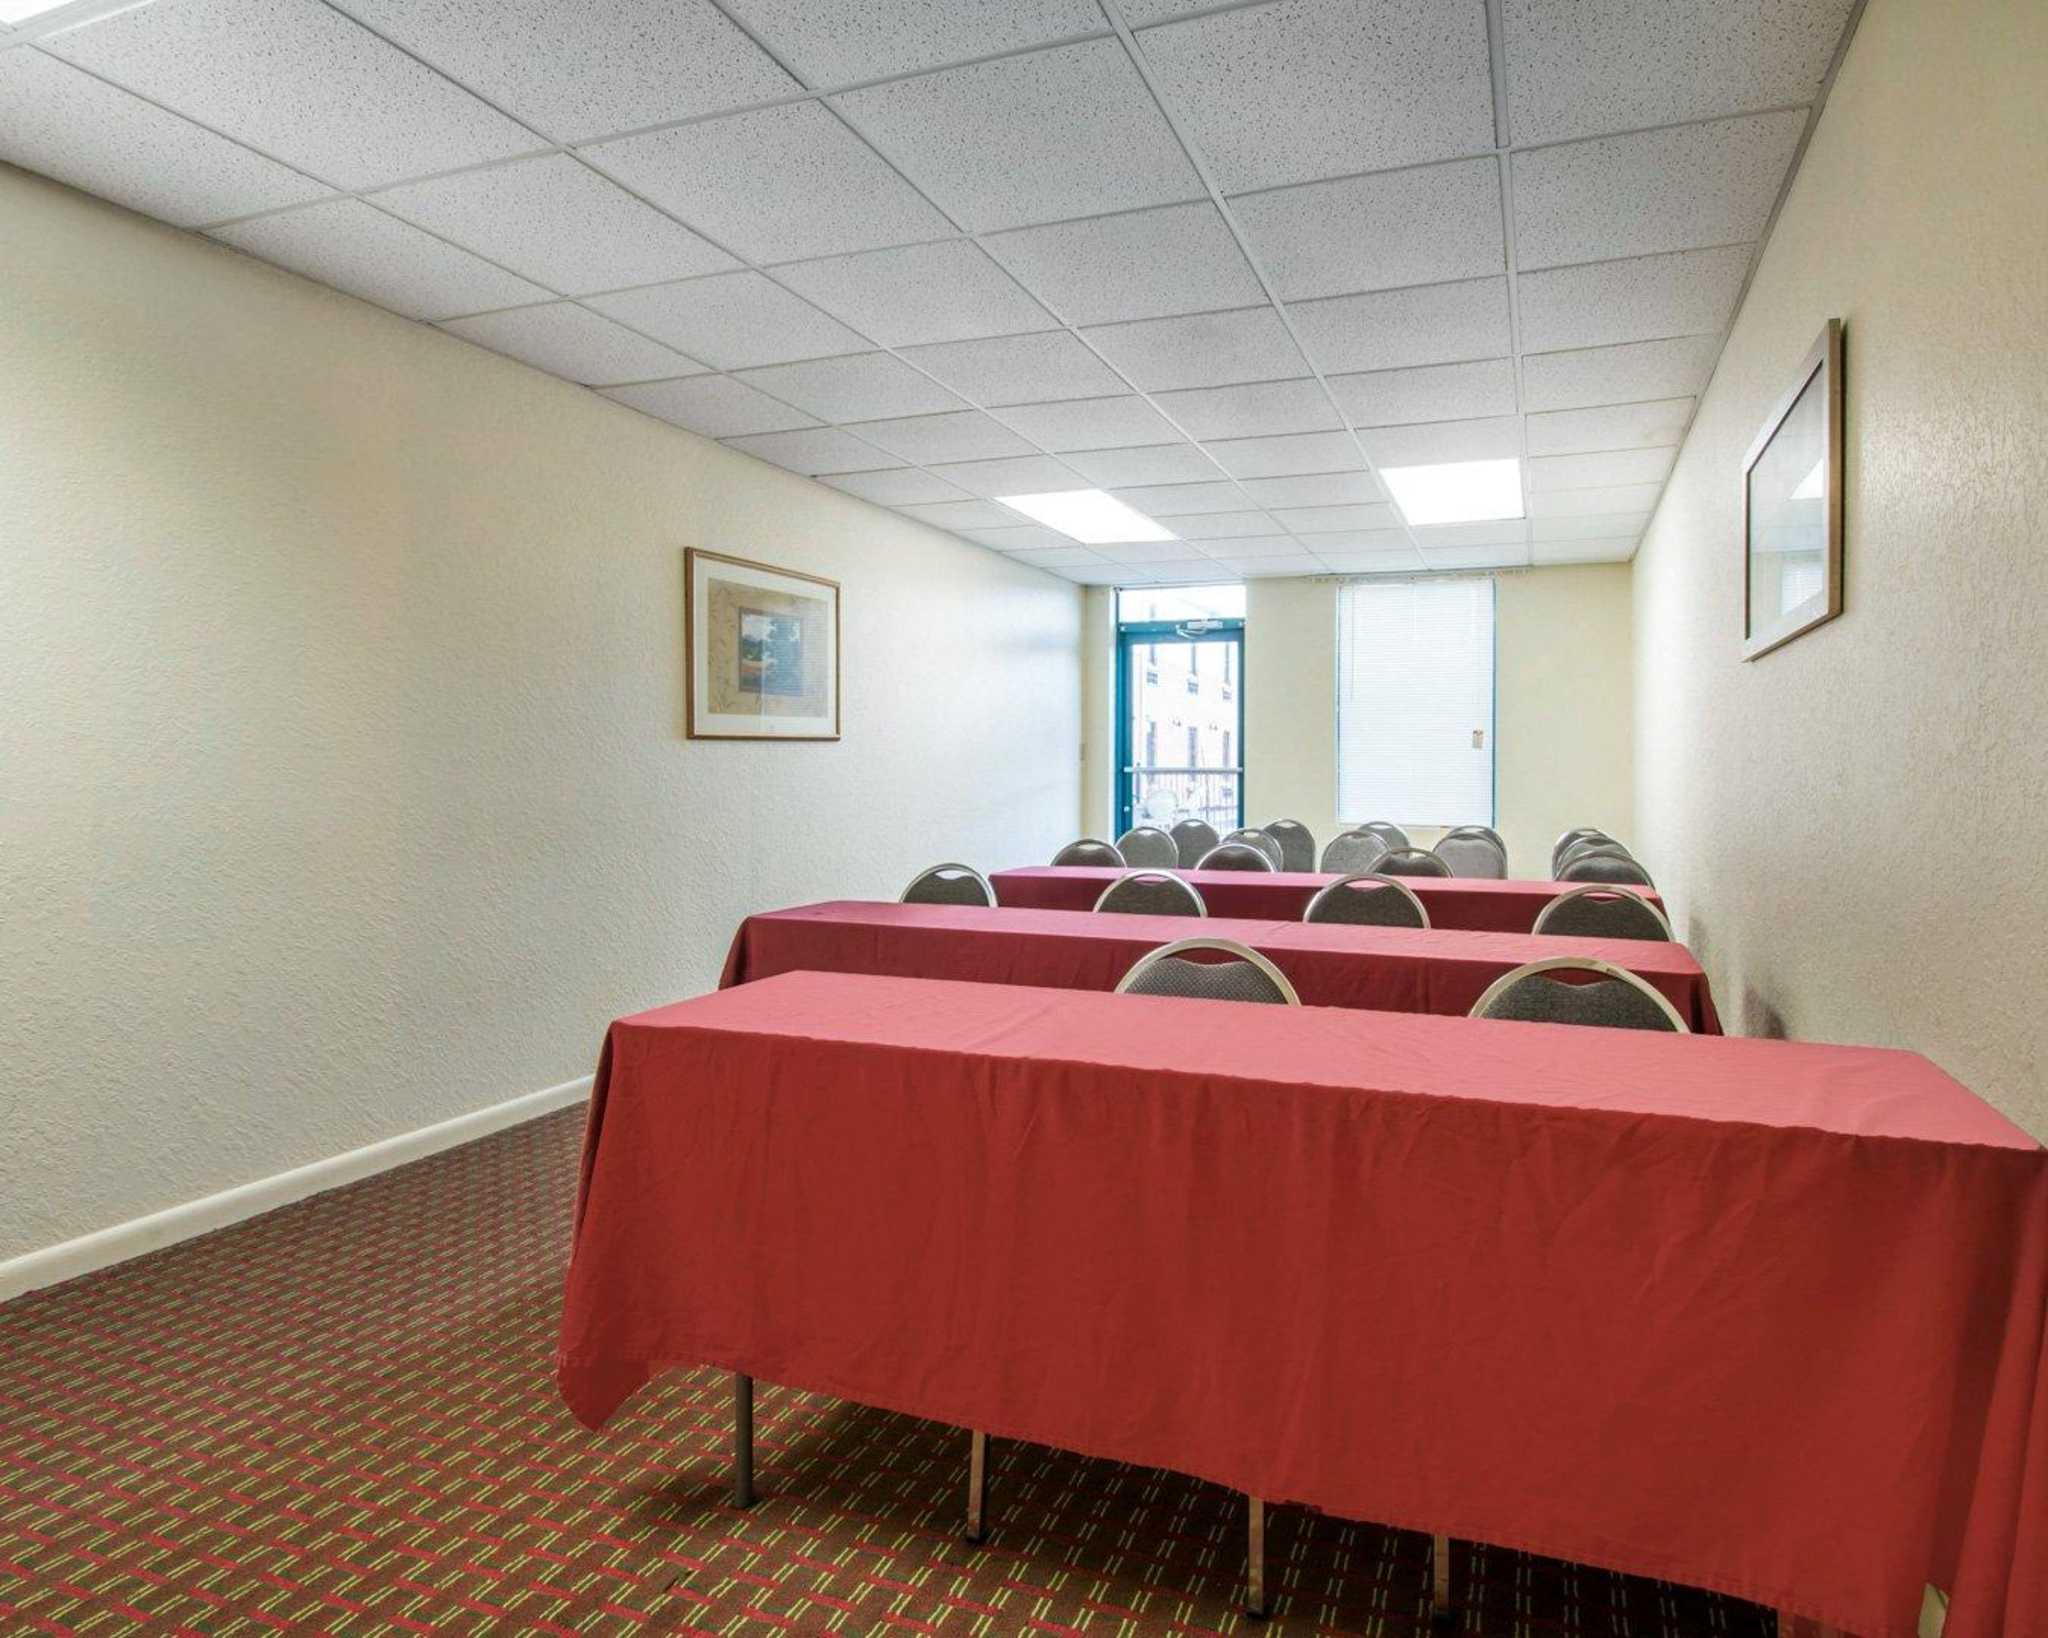 Rodeway Inn image 16